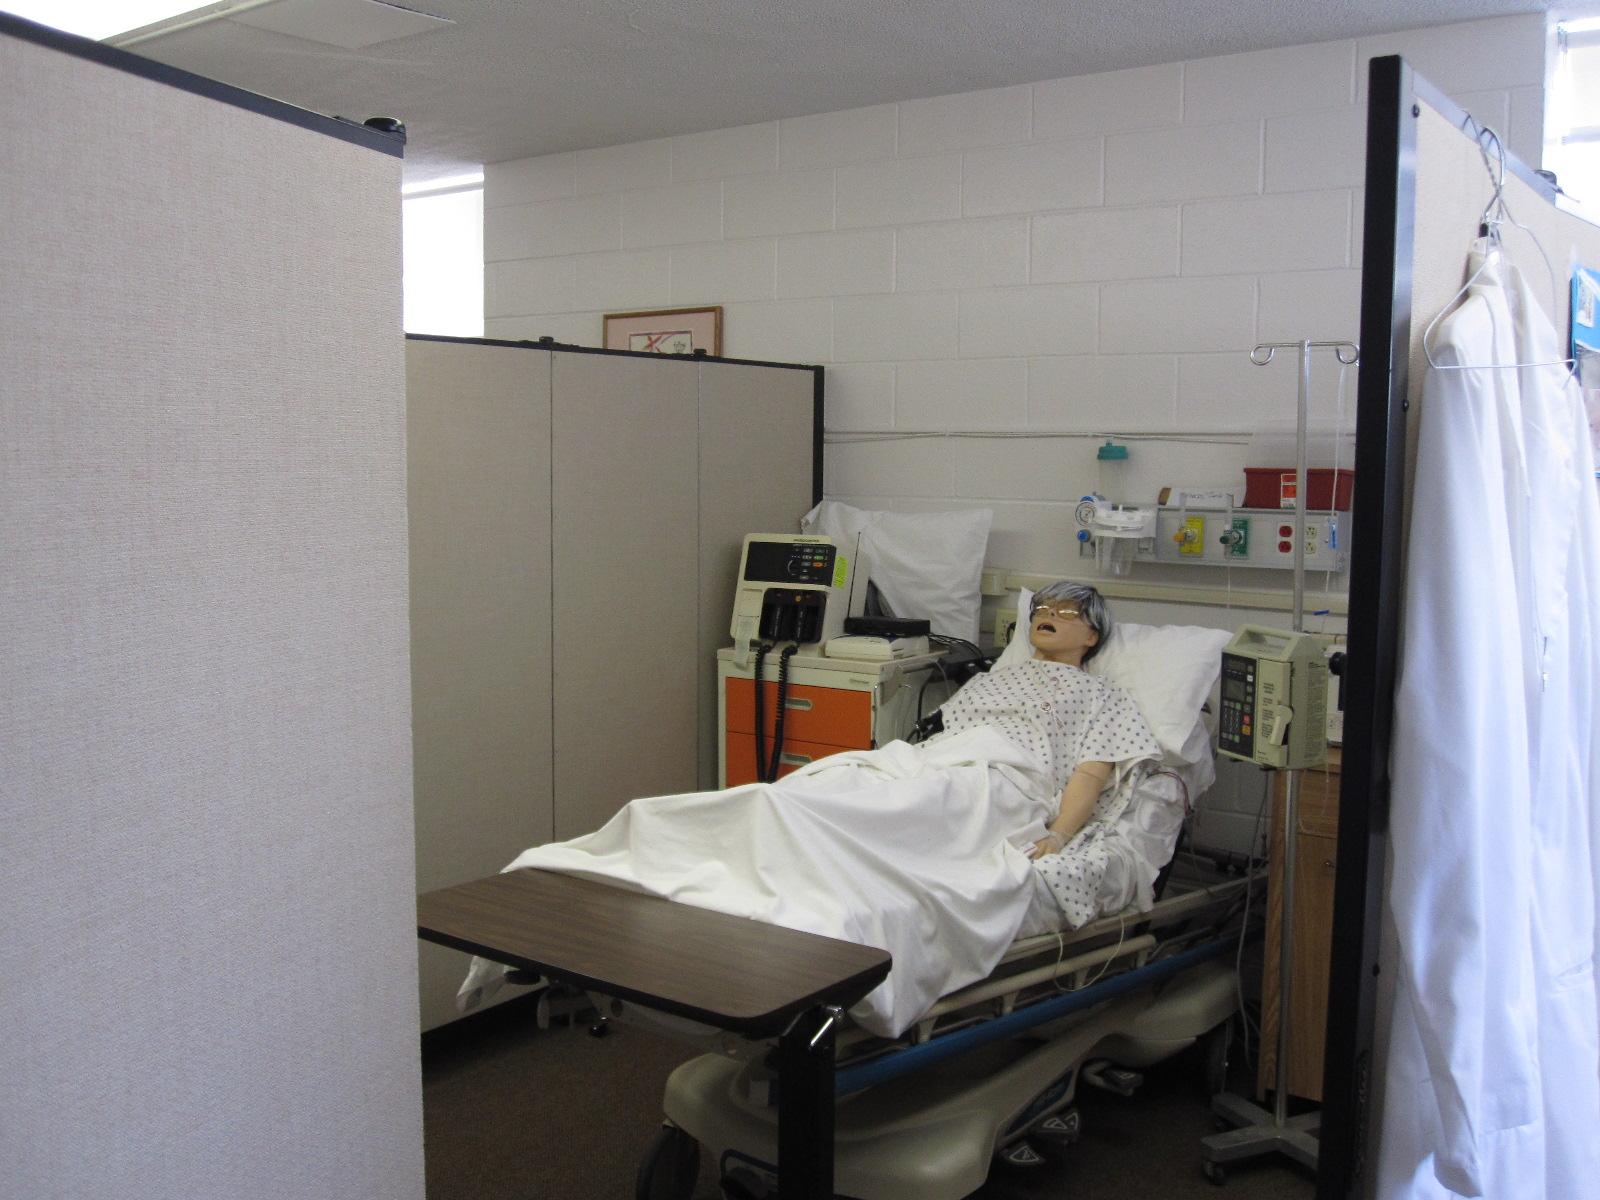 Room Divider Screens provide separation simulated hospital setting